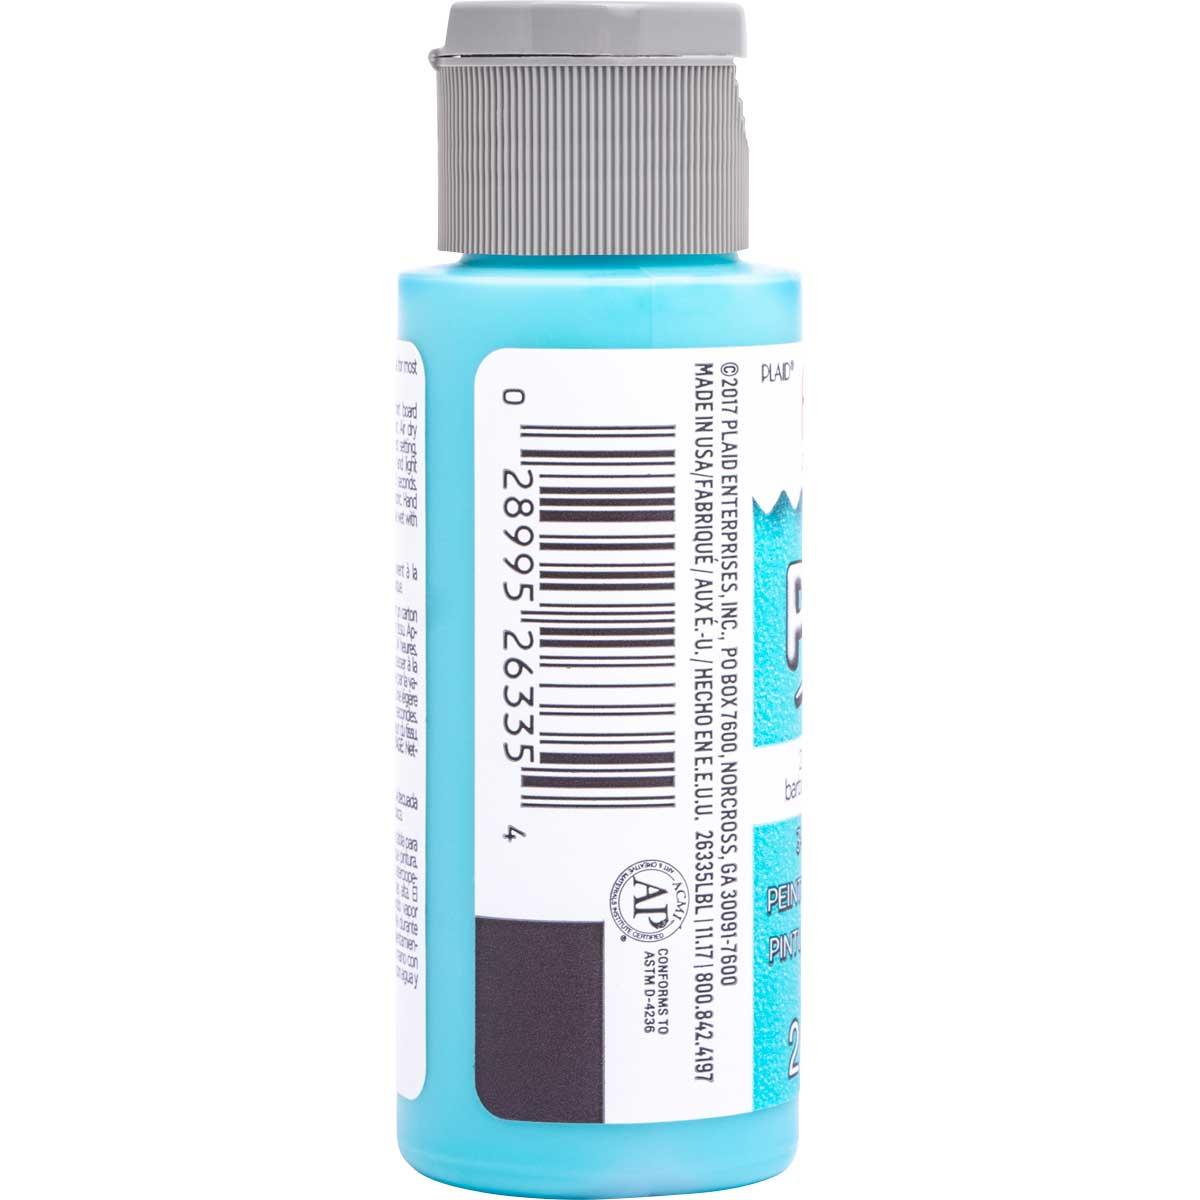 Fabric Creations™ Plush™ 3-D Fabric Paints - Blue Slushie, 2 oz.